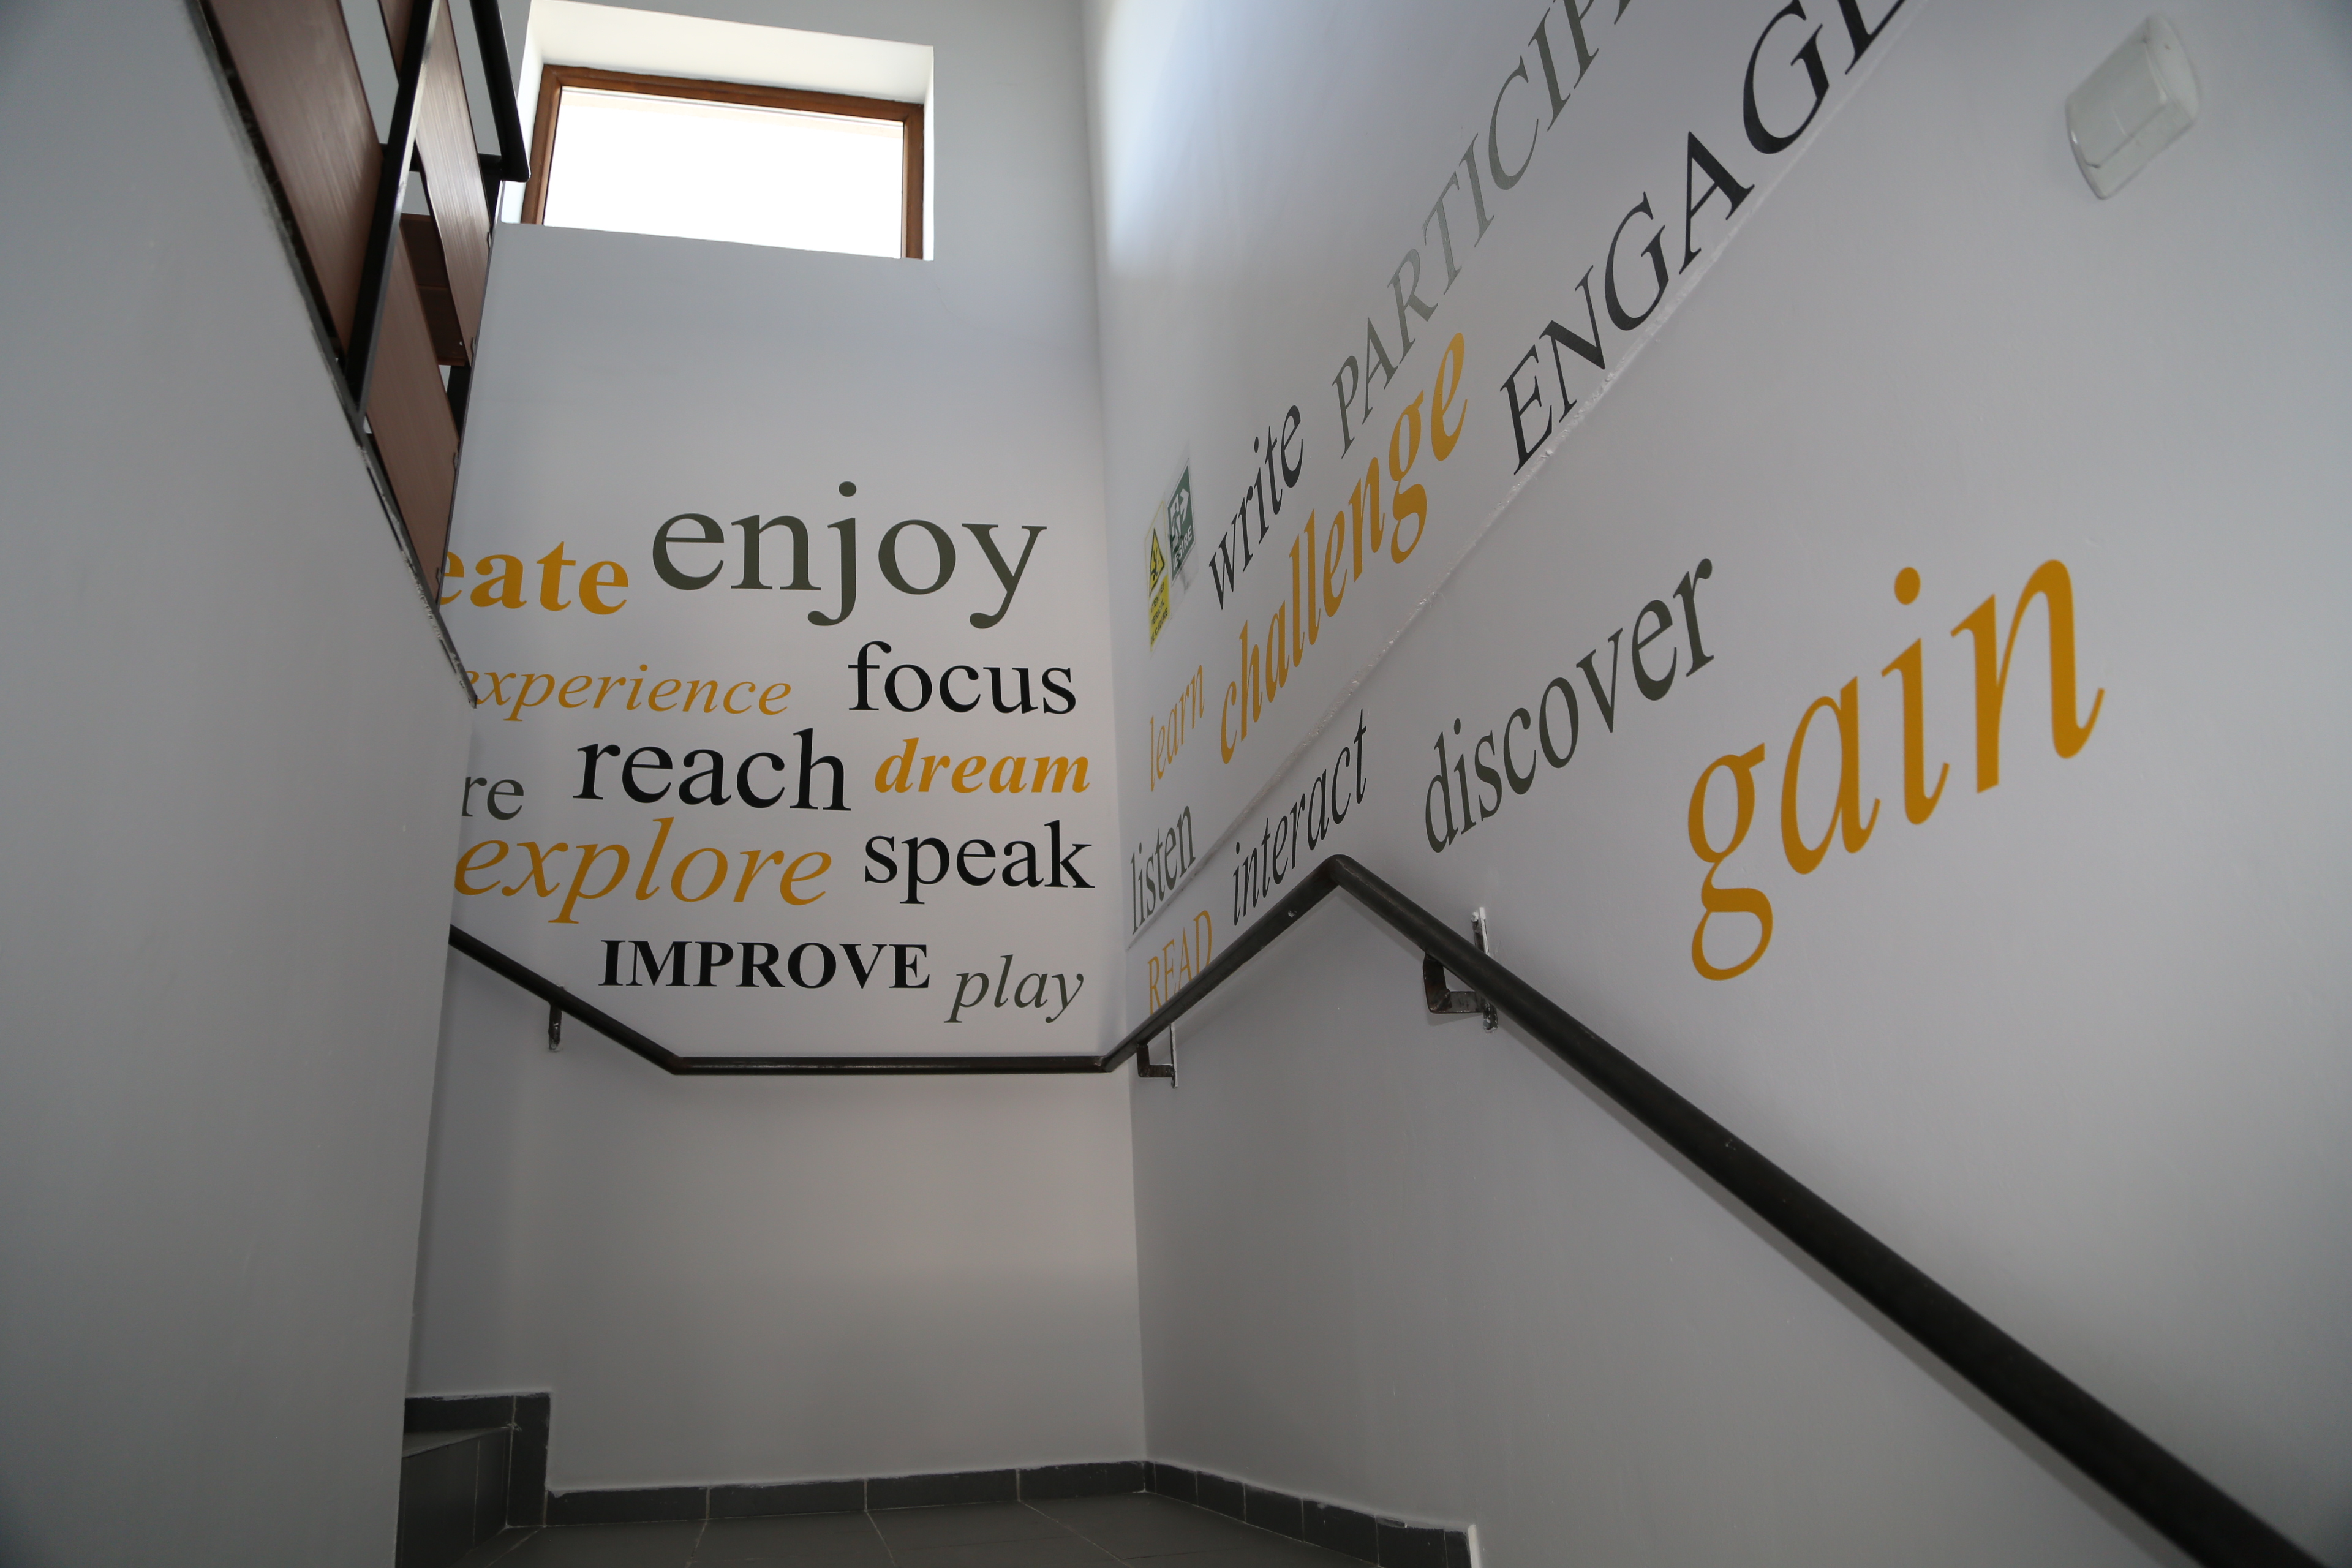 Cuvinte pe pereti